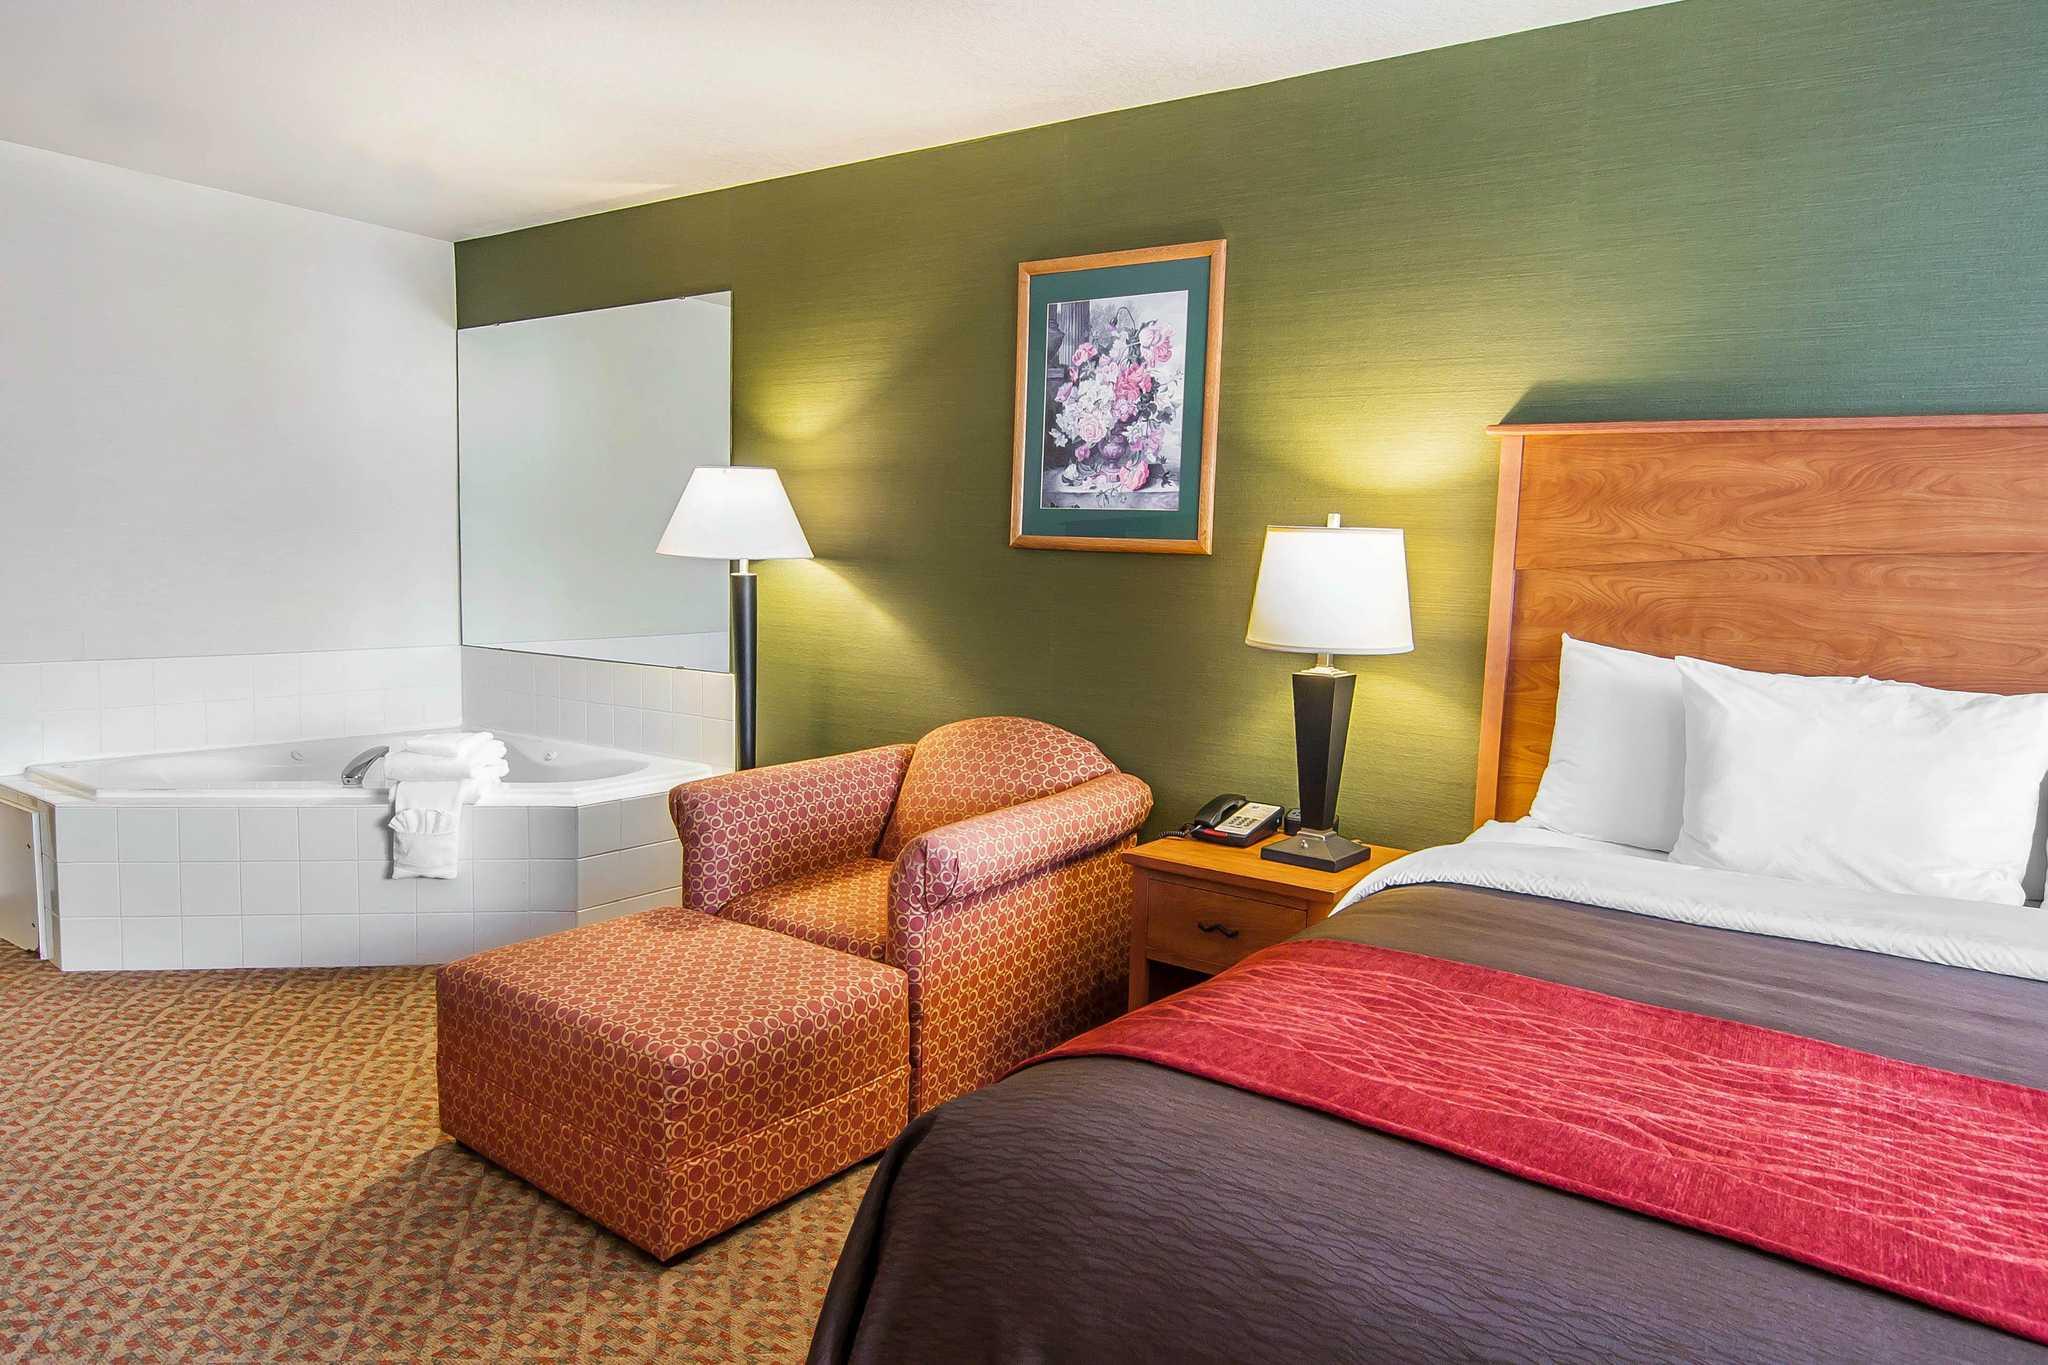 Comfort Inn & Suites image 51